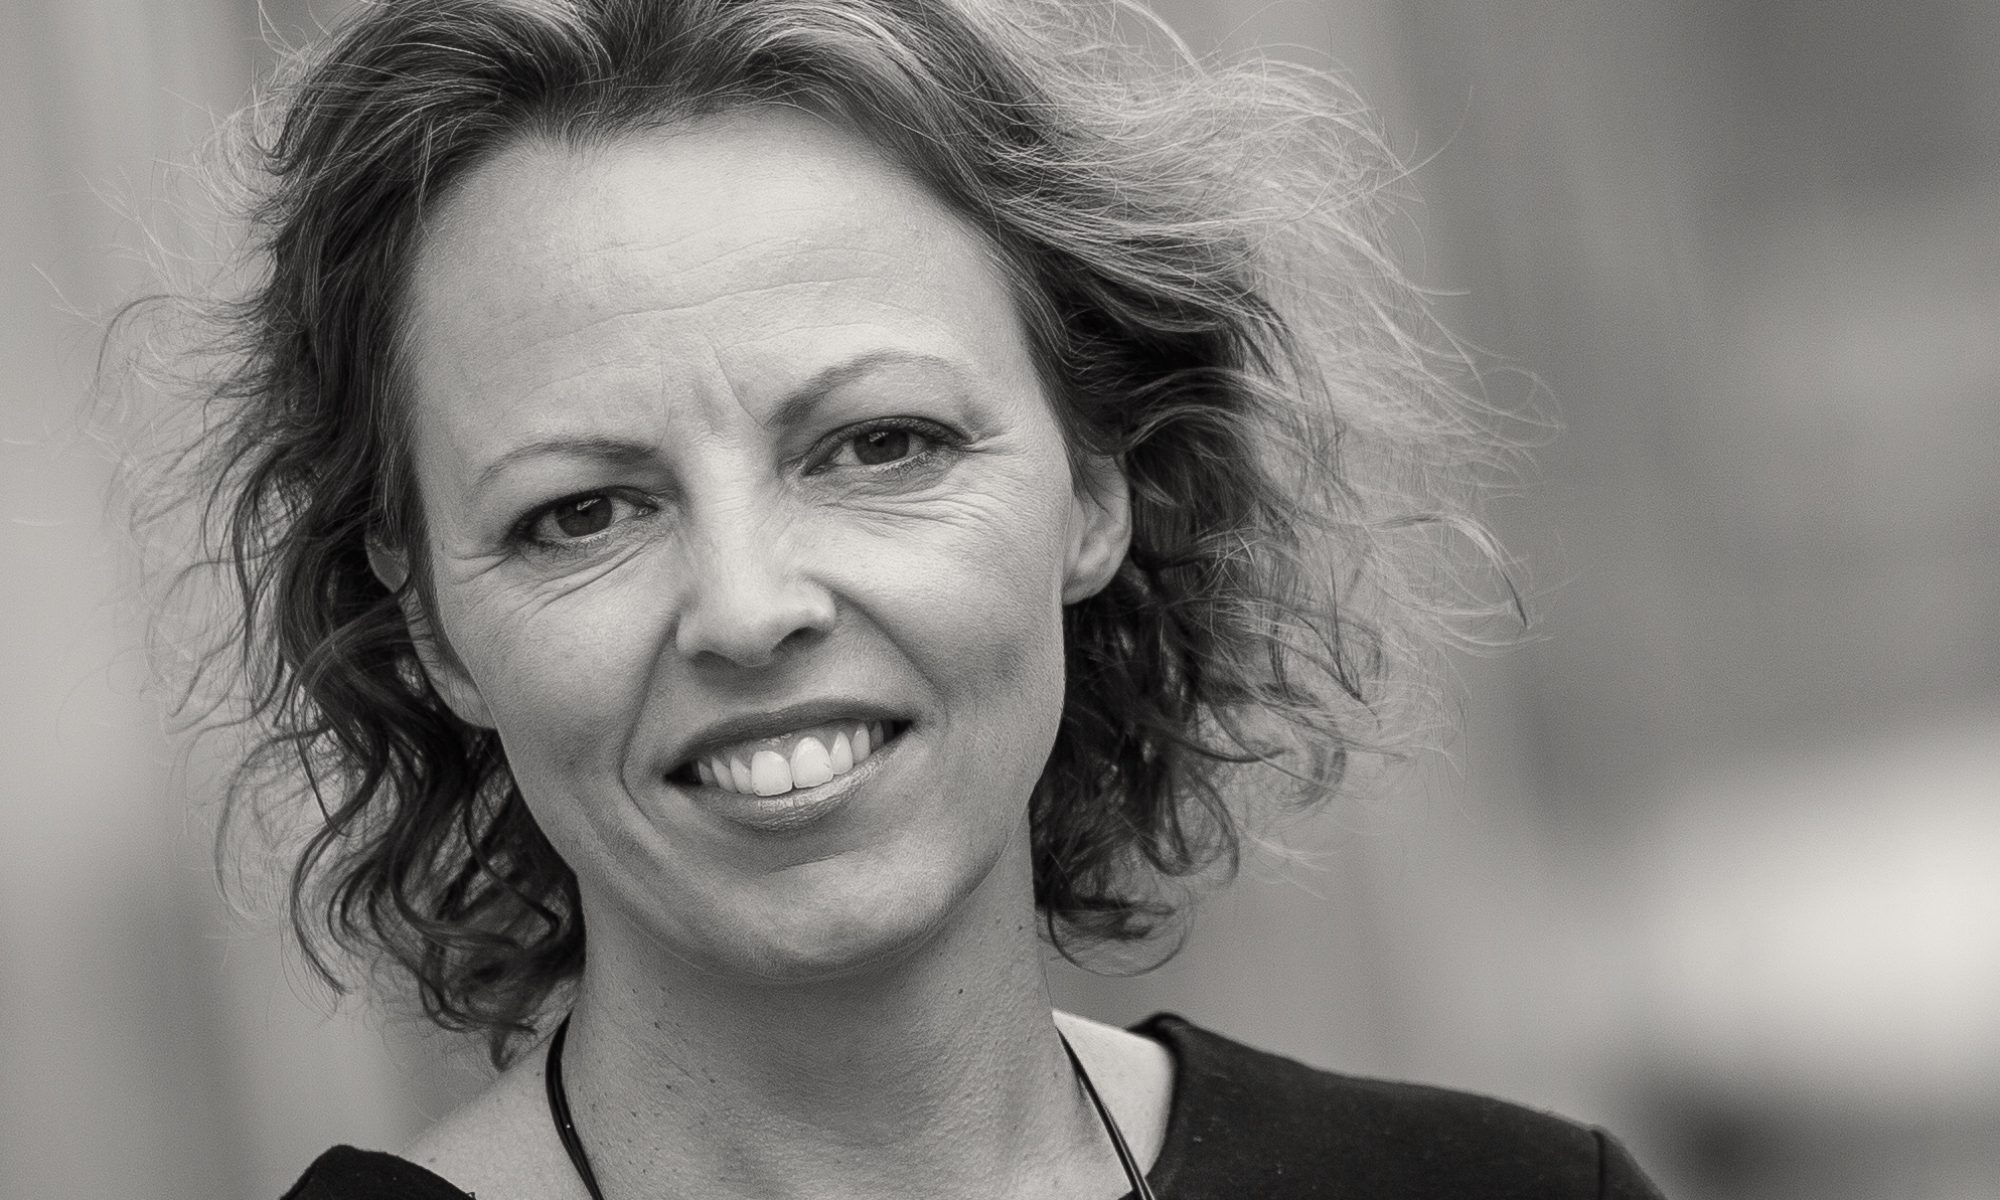 Anne-Mette Sohn Jensen